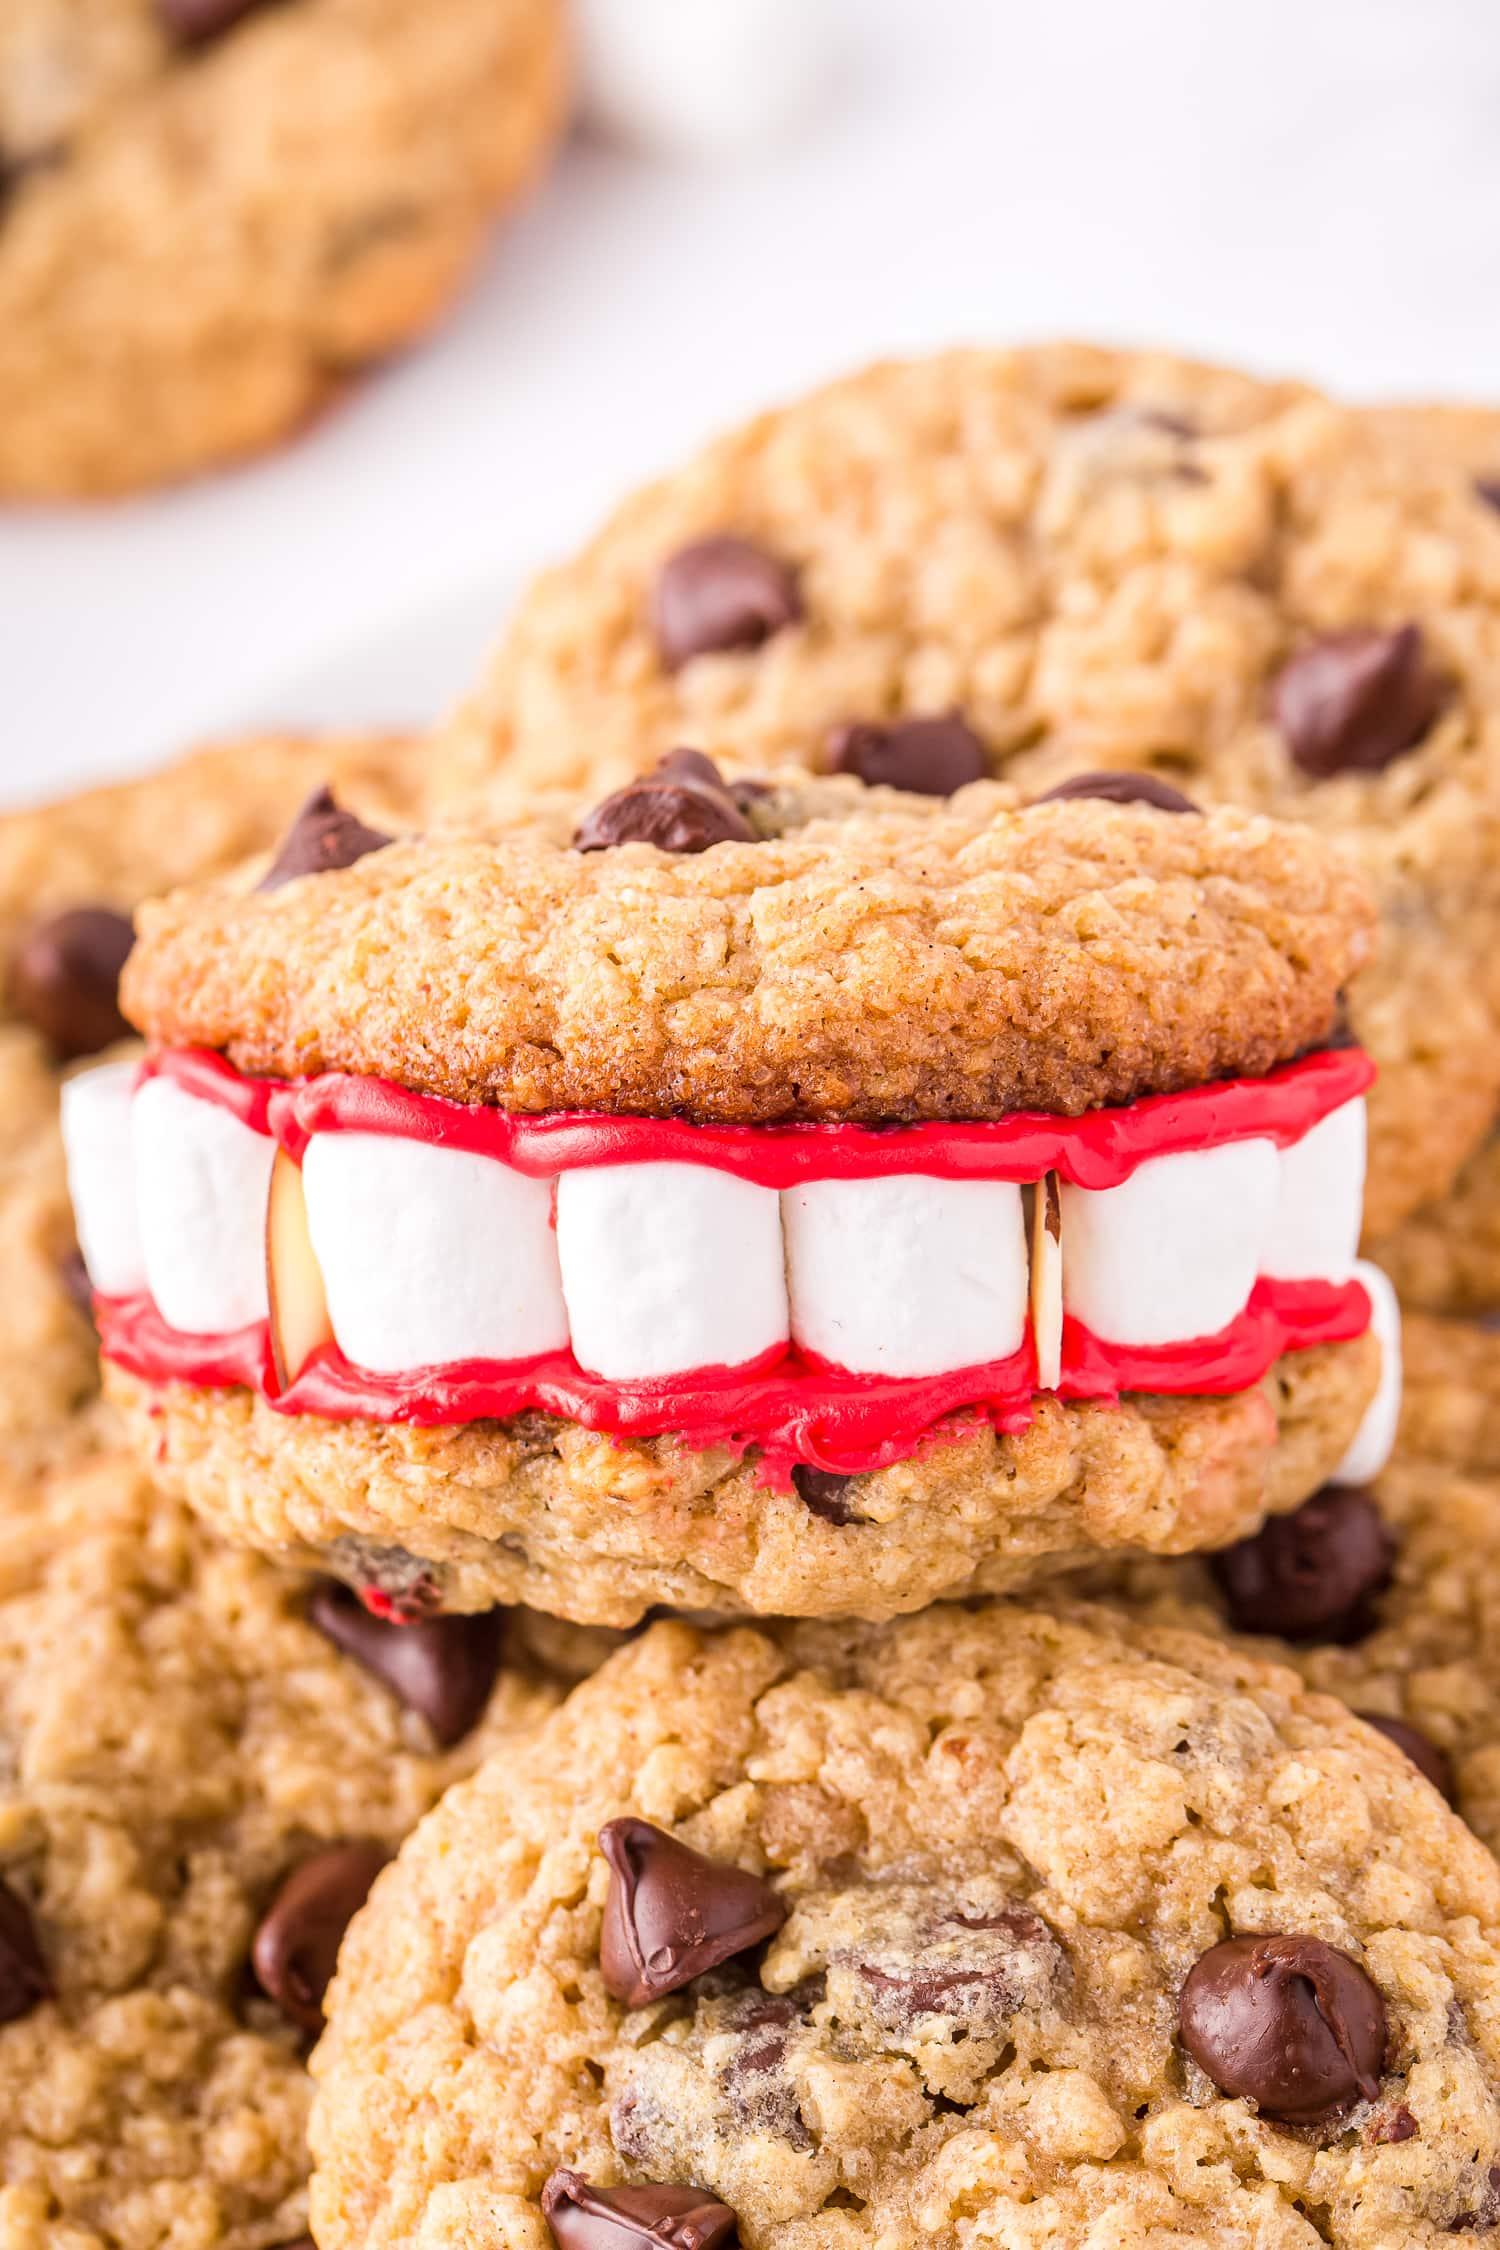 Dracula Denture cookie sitting on top of more